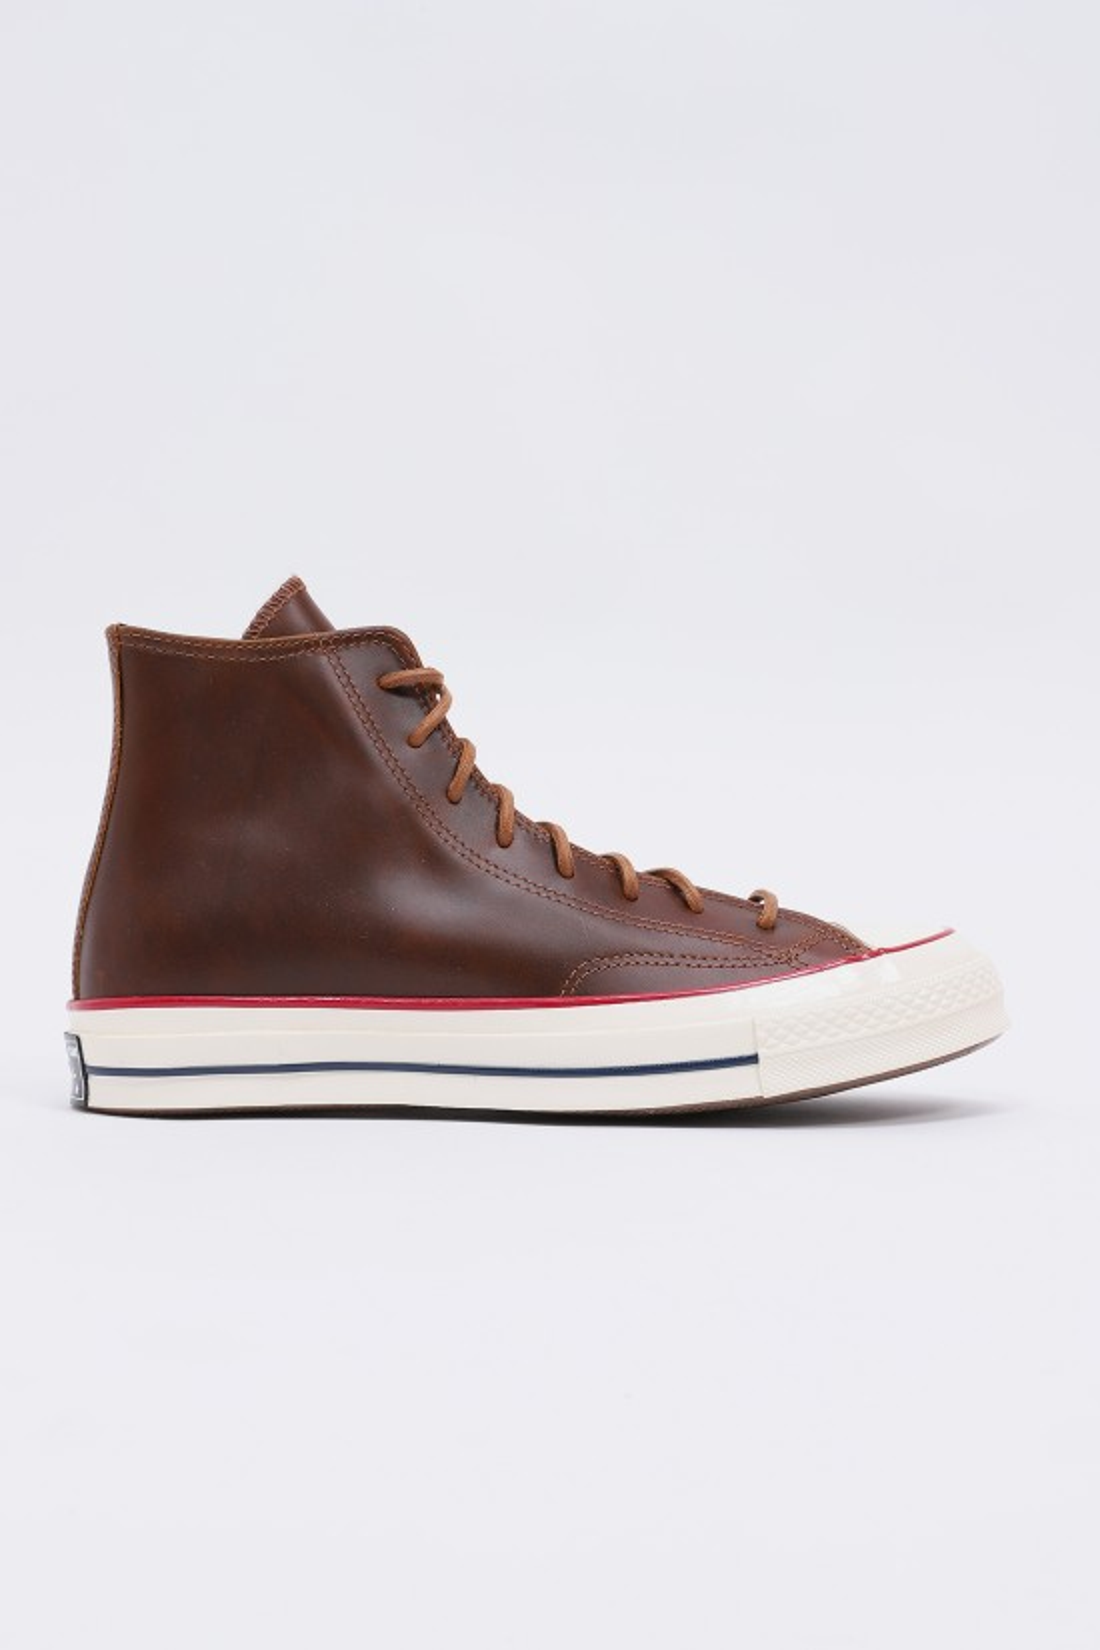 CONVERSE / Ctas 70's hi leather Clove brown